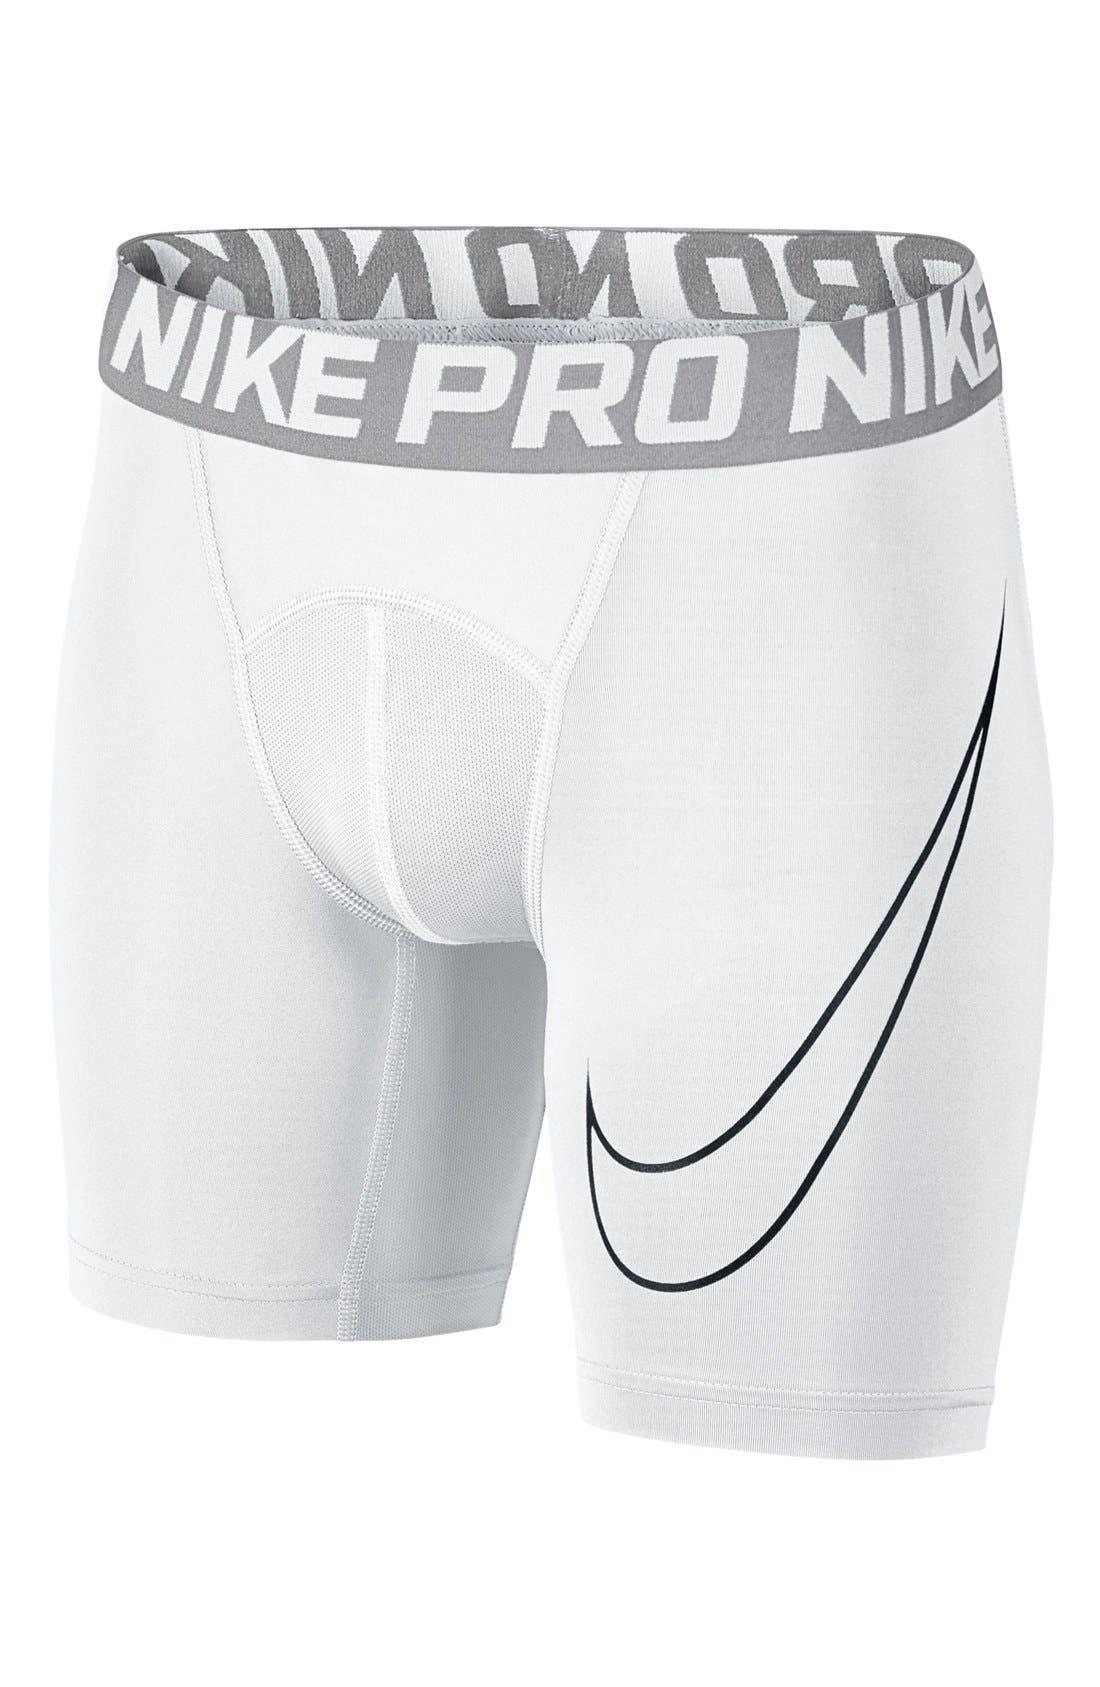 NIKE 'Pro Cool Compression' Dri-FIT Shorts